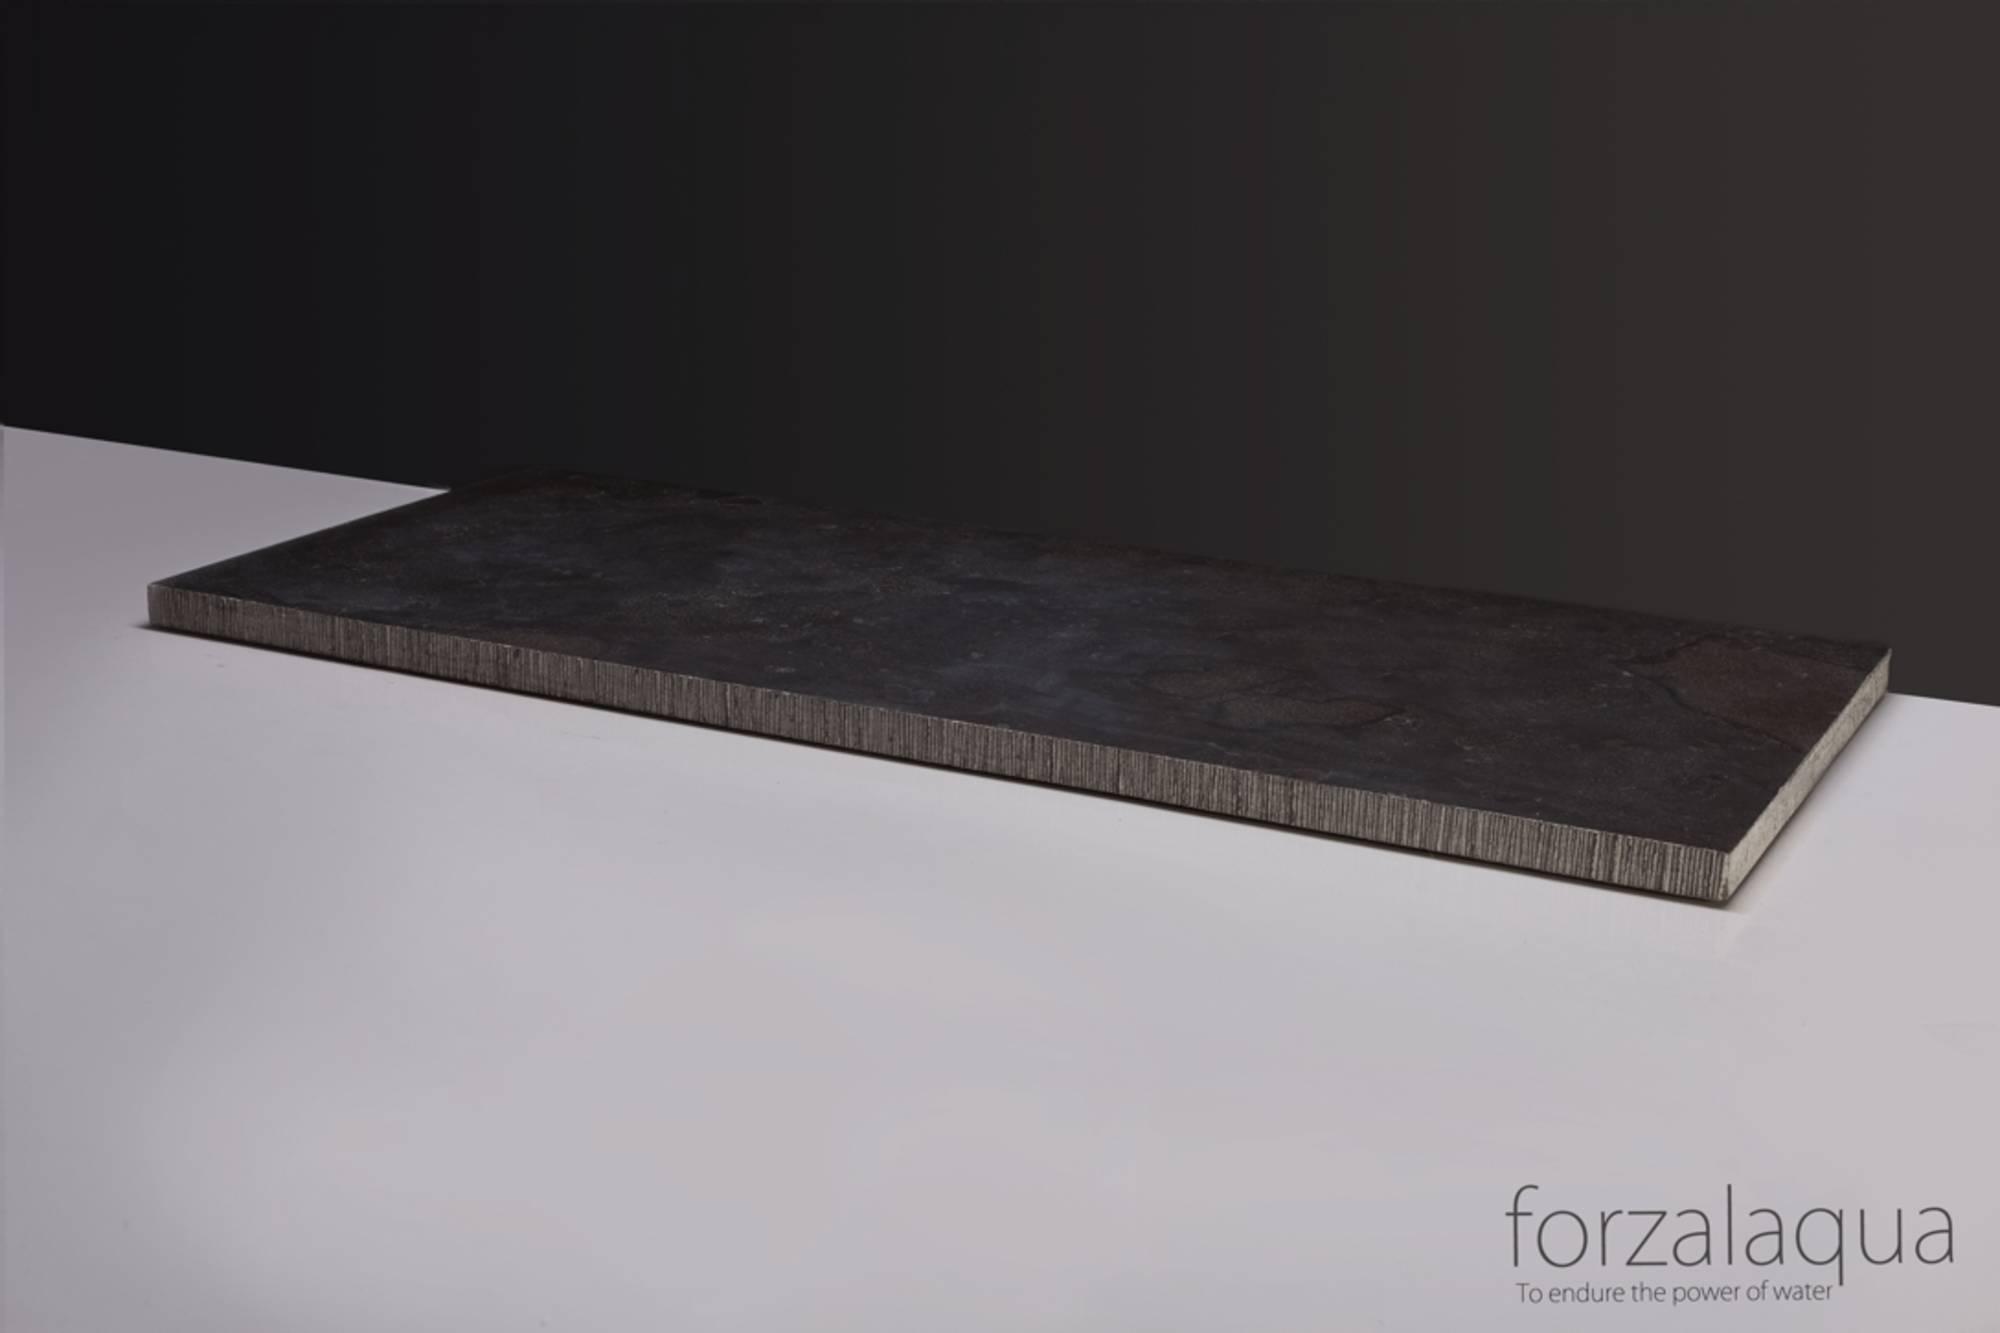 Forzalaqua Plateau 120,5 x 51,5 x 3,0 cm Hardsteen gefrijnd